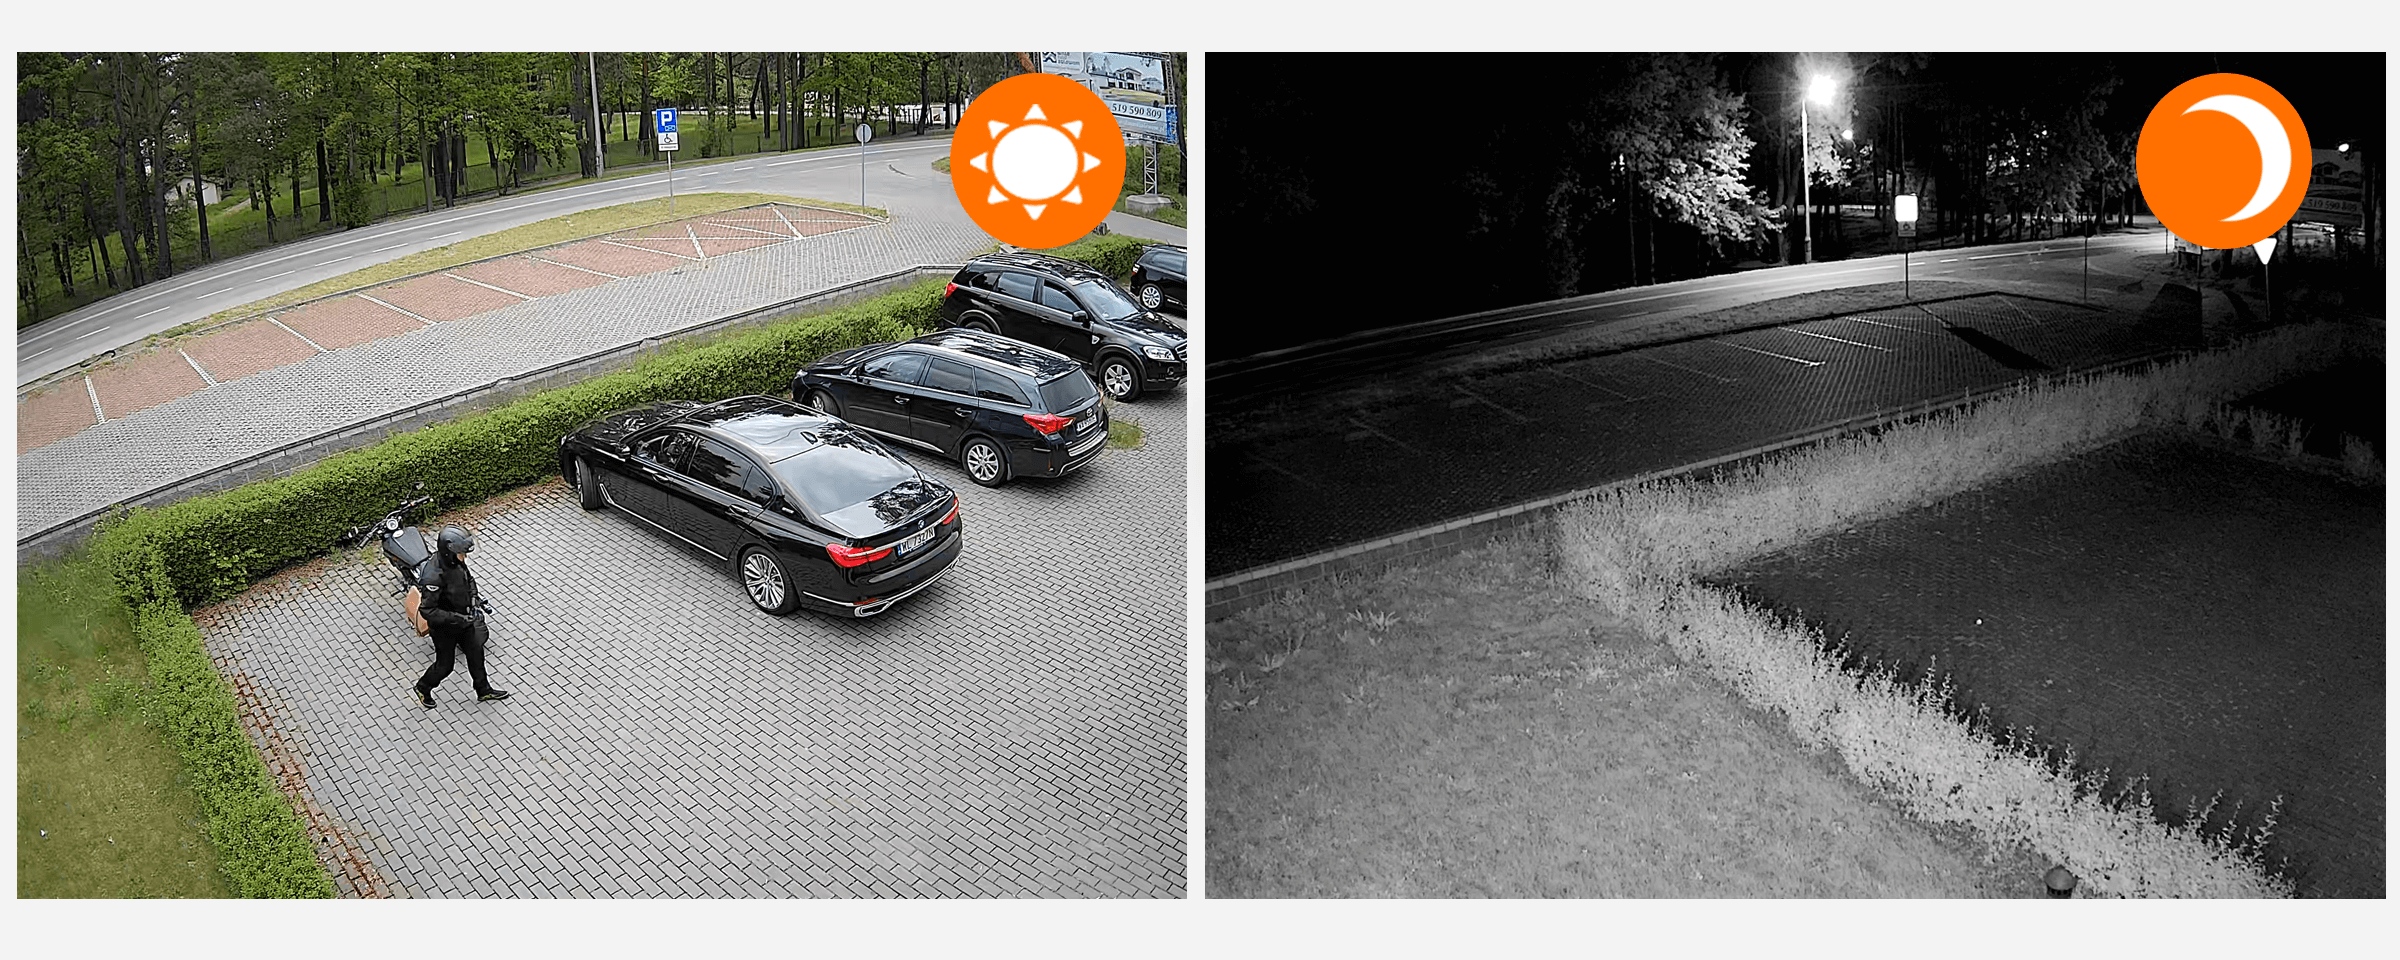 kamera domowa z alarmem na telefon po wykryciu ruchu orllo.pl